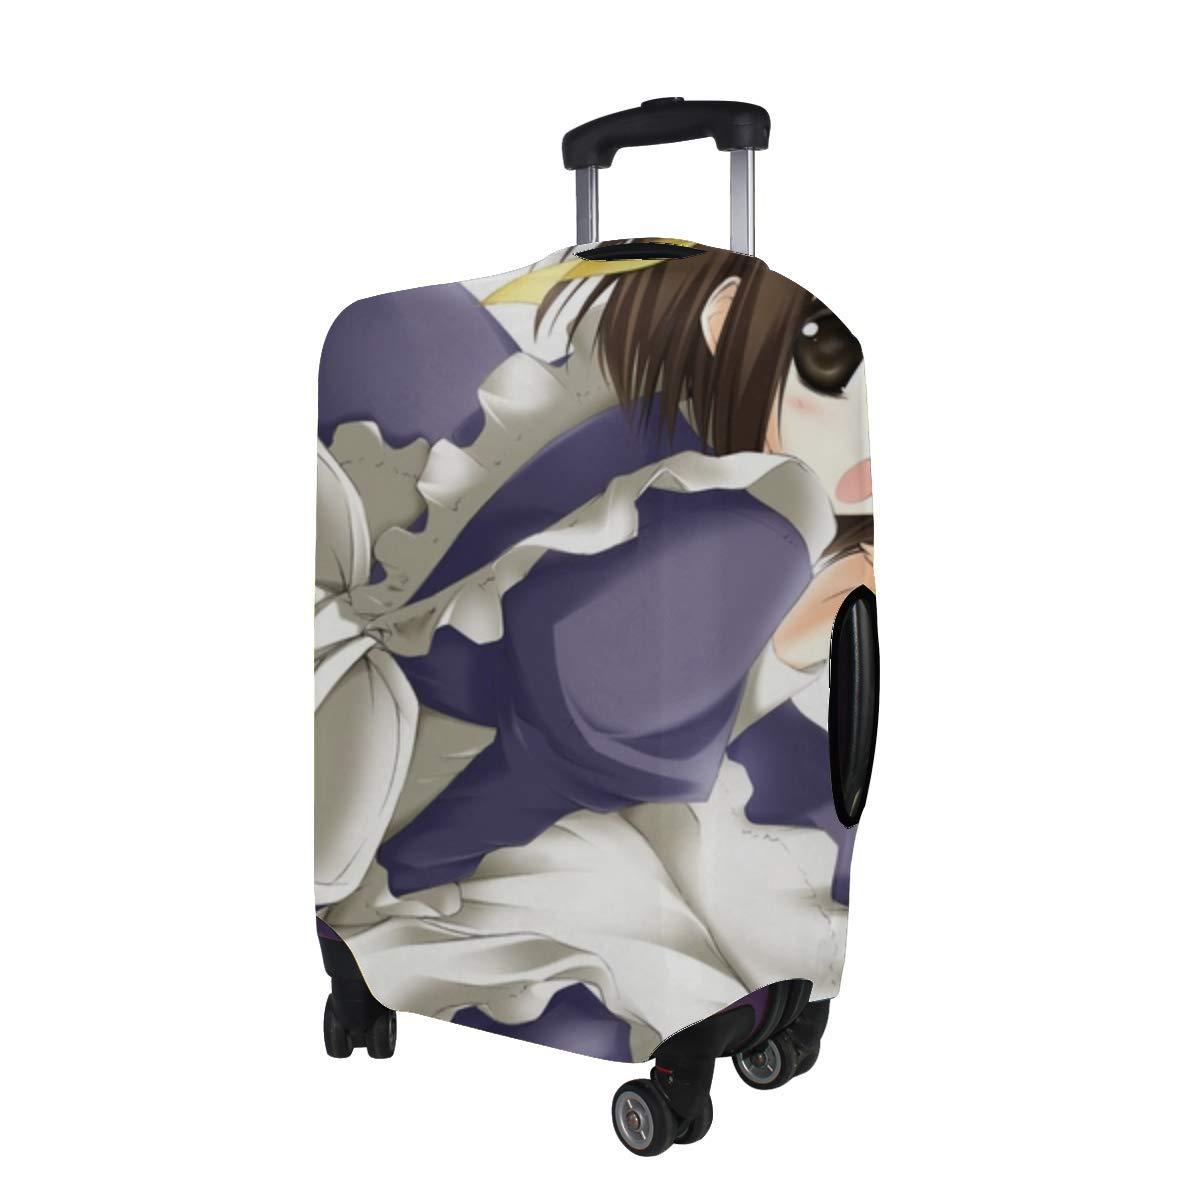 Zol1Q Lightweight Waterproof Large Storage Drawstring Bag for Men /& Women Pizza Cinch Backpack Sackpack Tote Sack